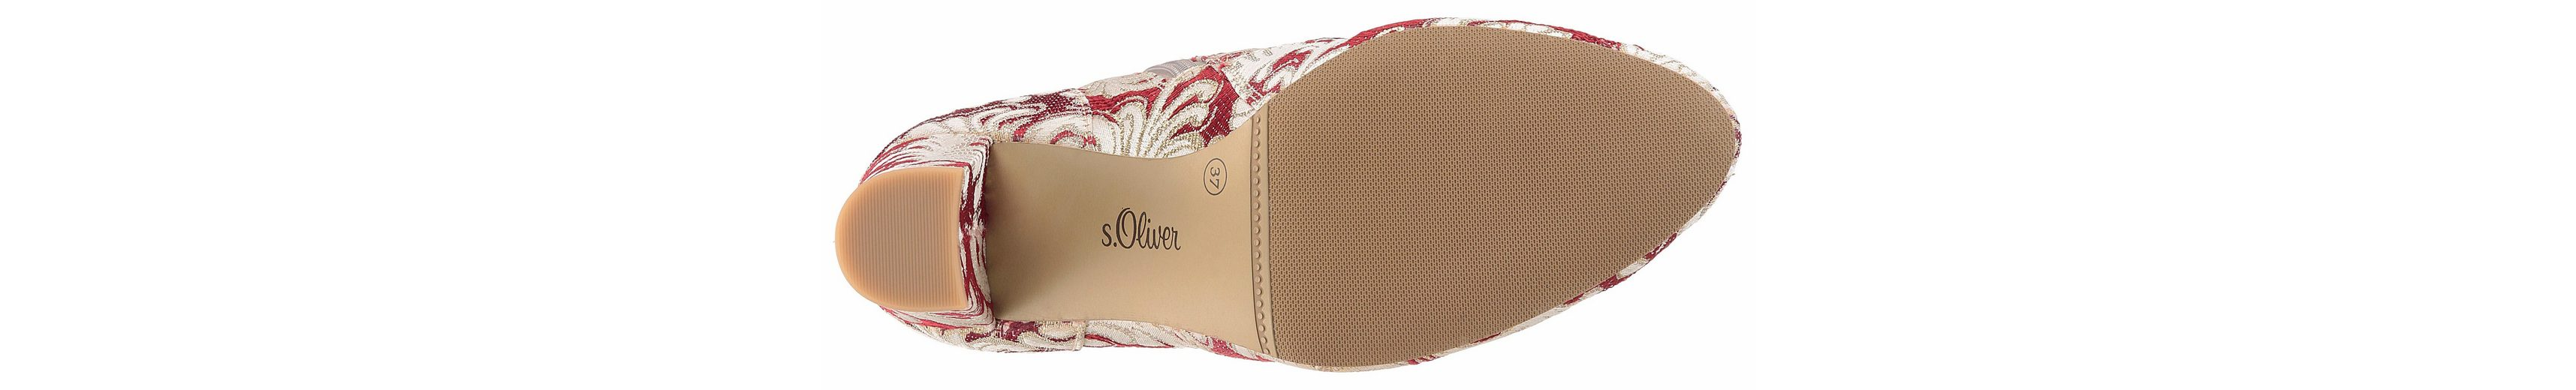 s.Oliver RED LABEL Stiefelette, in aufwändigem Materialdesgin